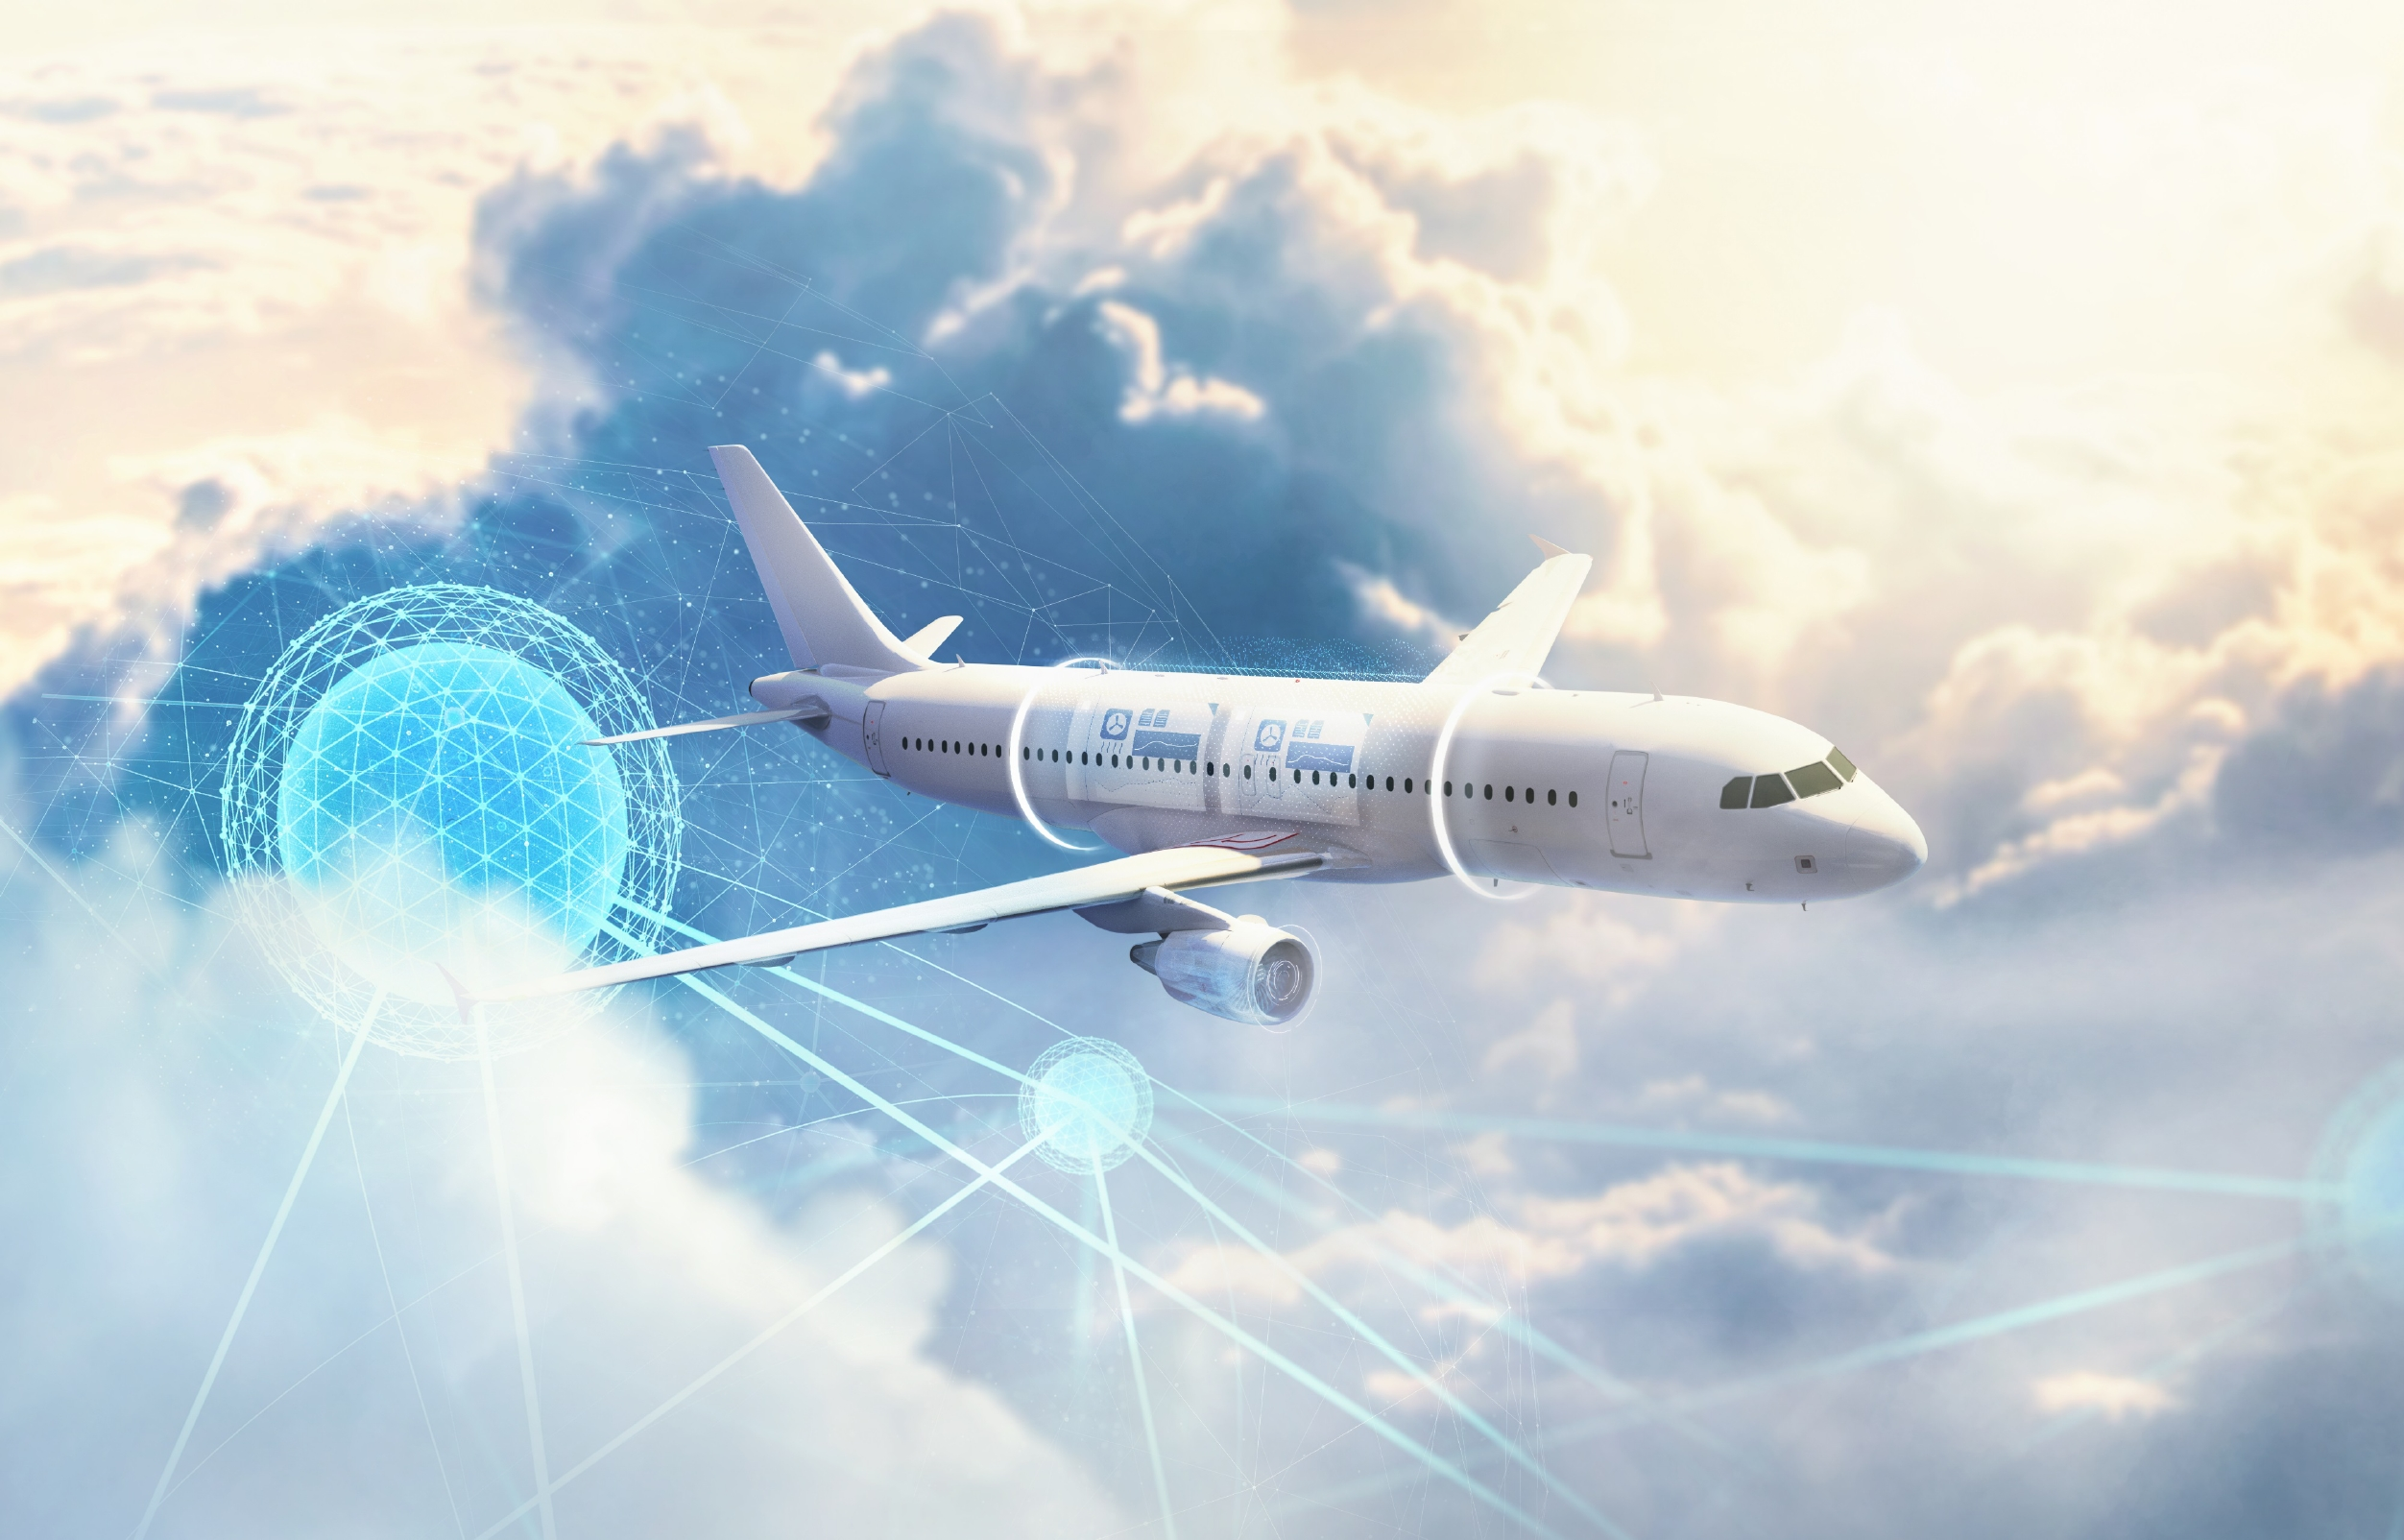 hangar-a-same day expedited air cargo shipping and e-booking